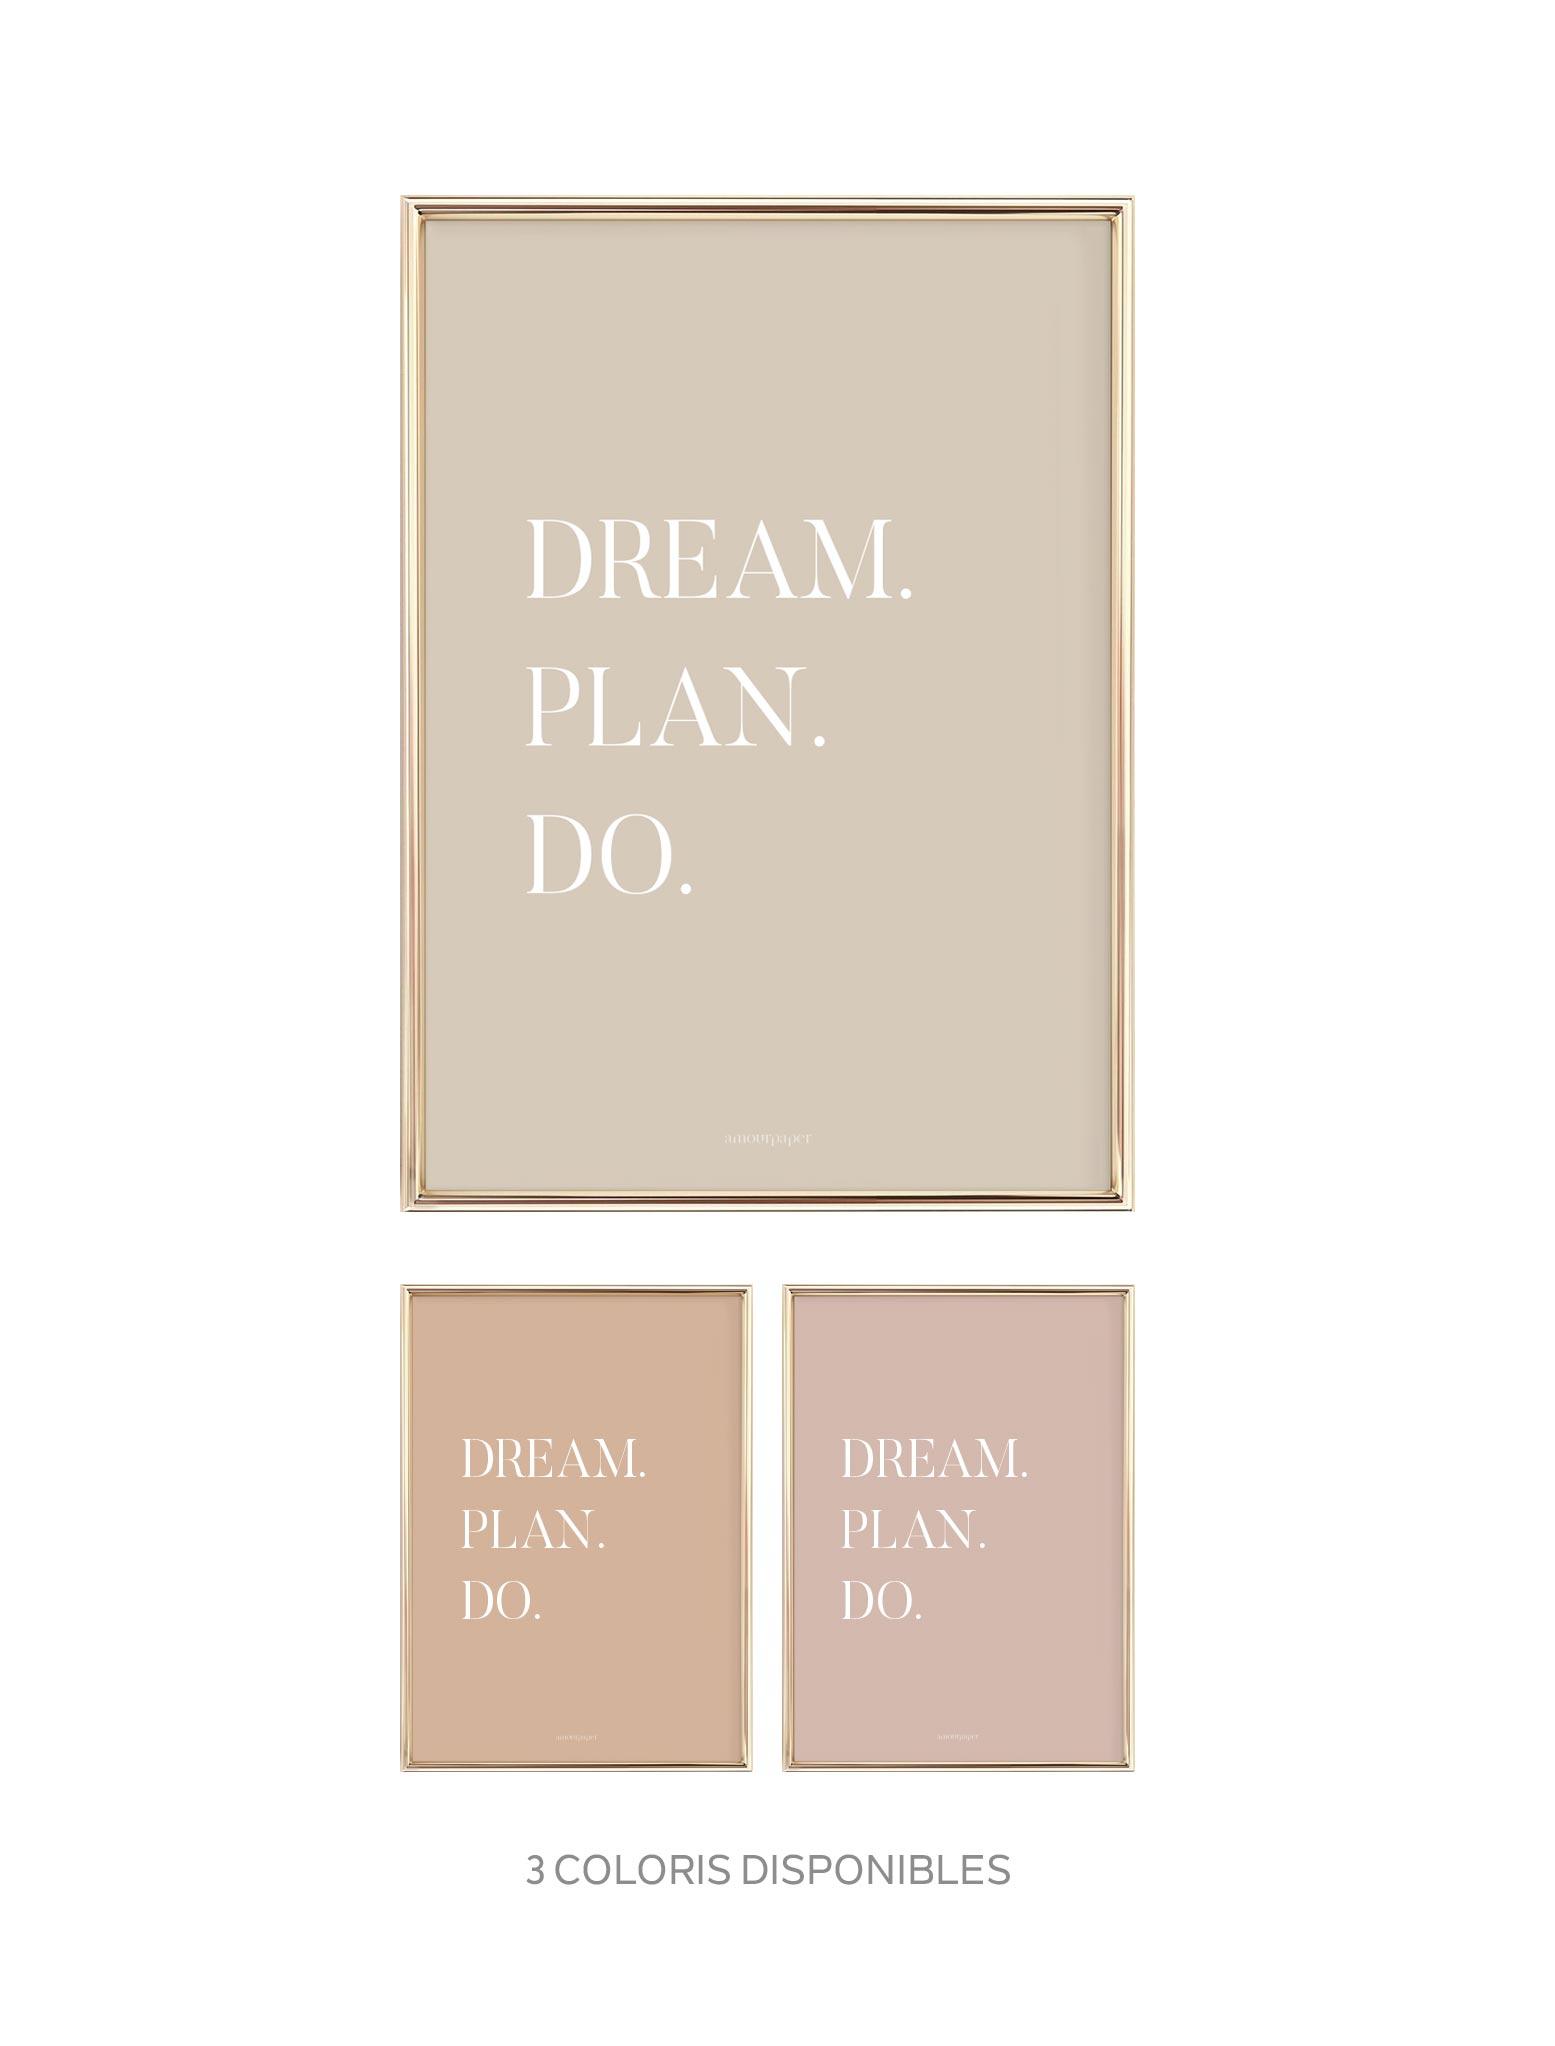 affiche dream plan do deco